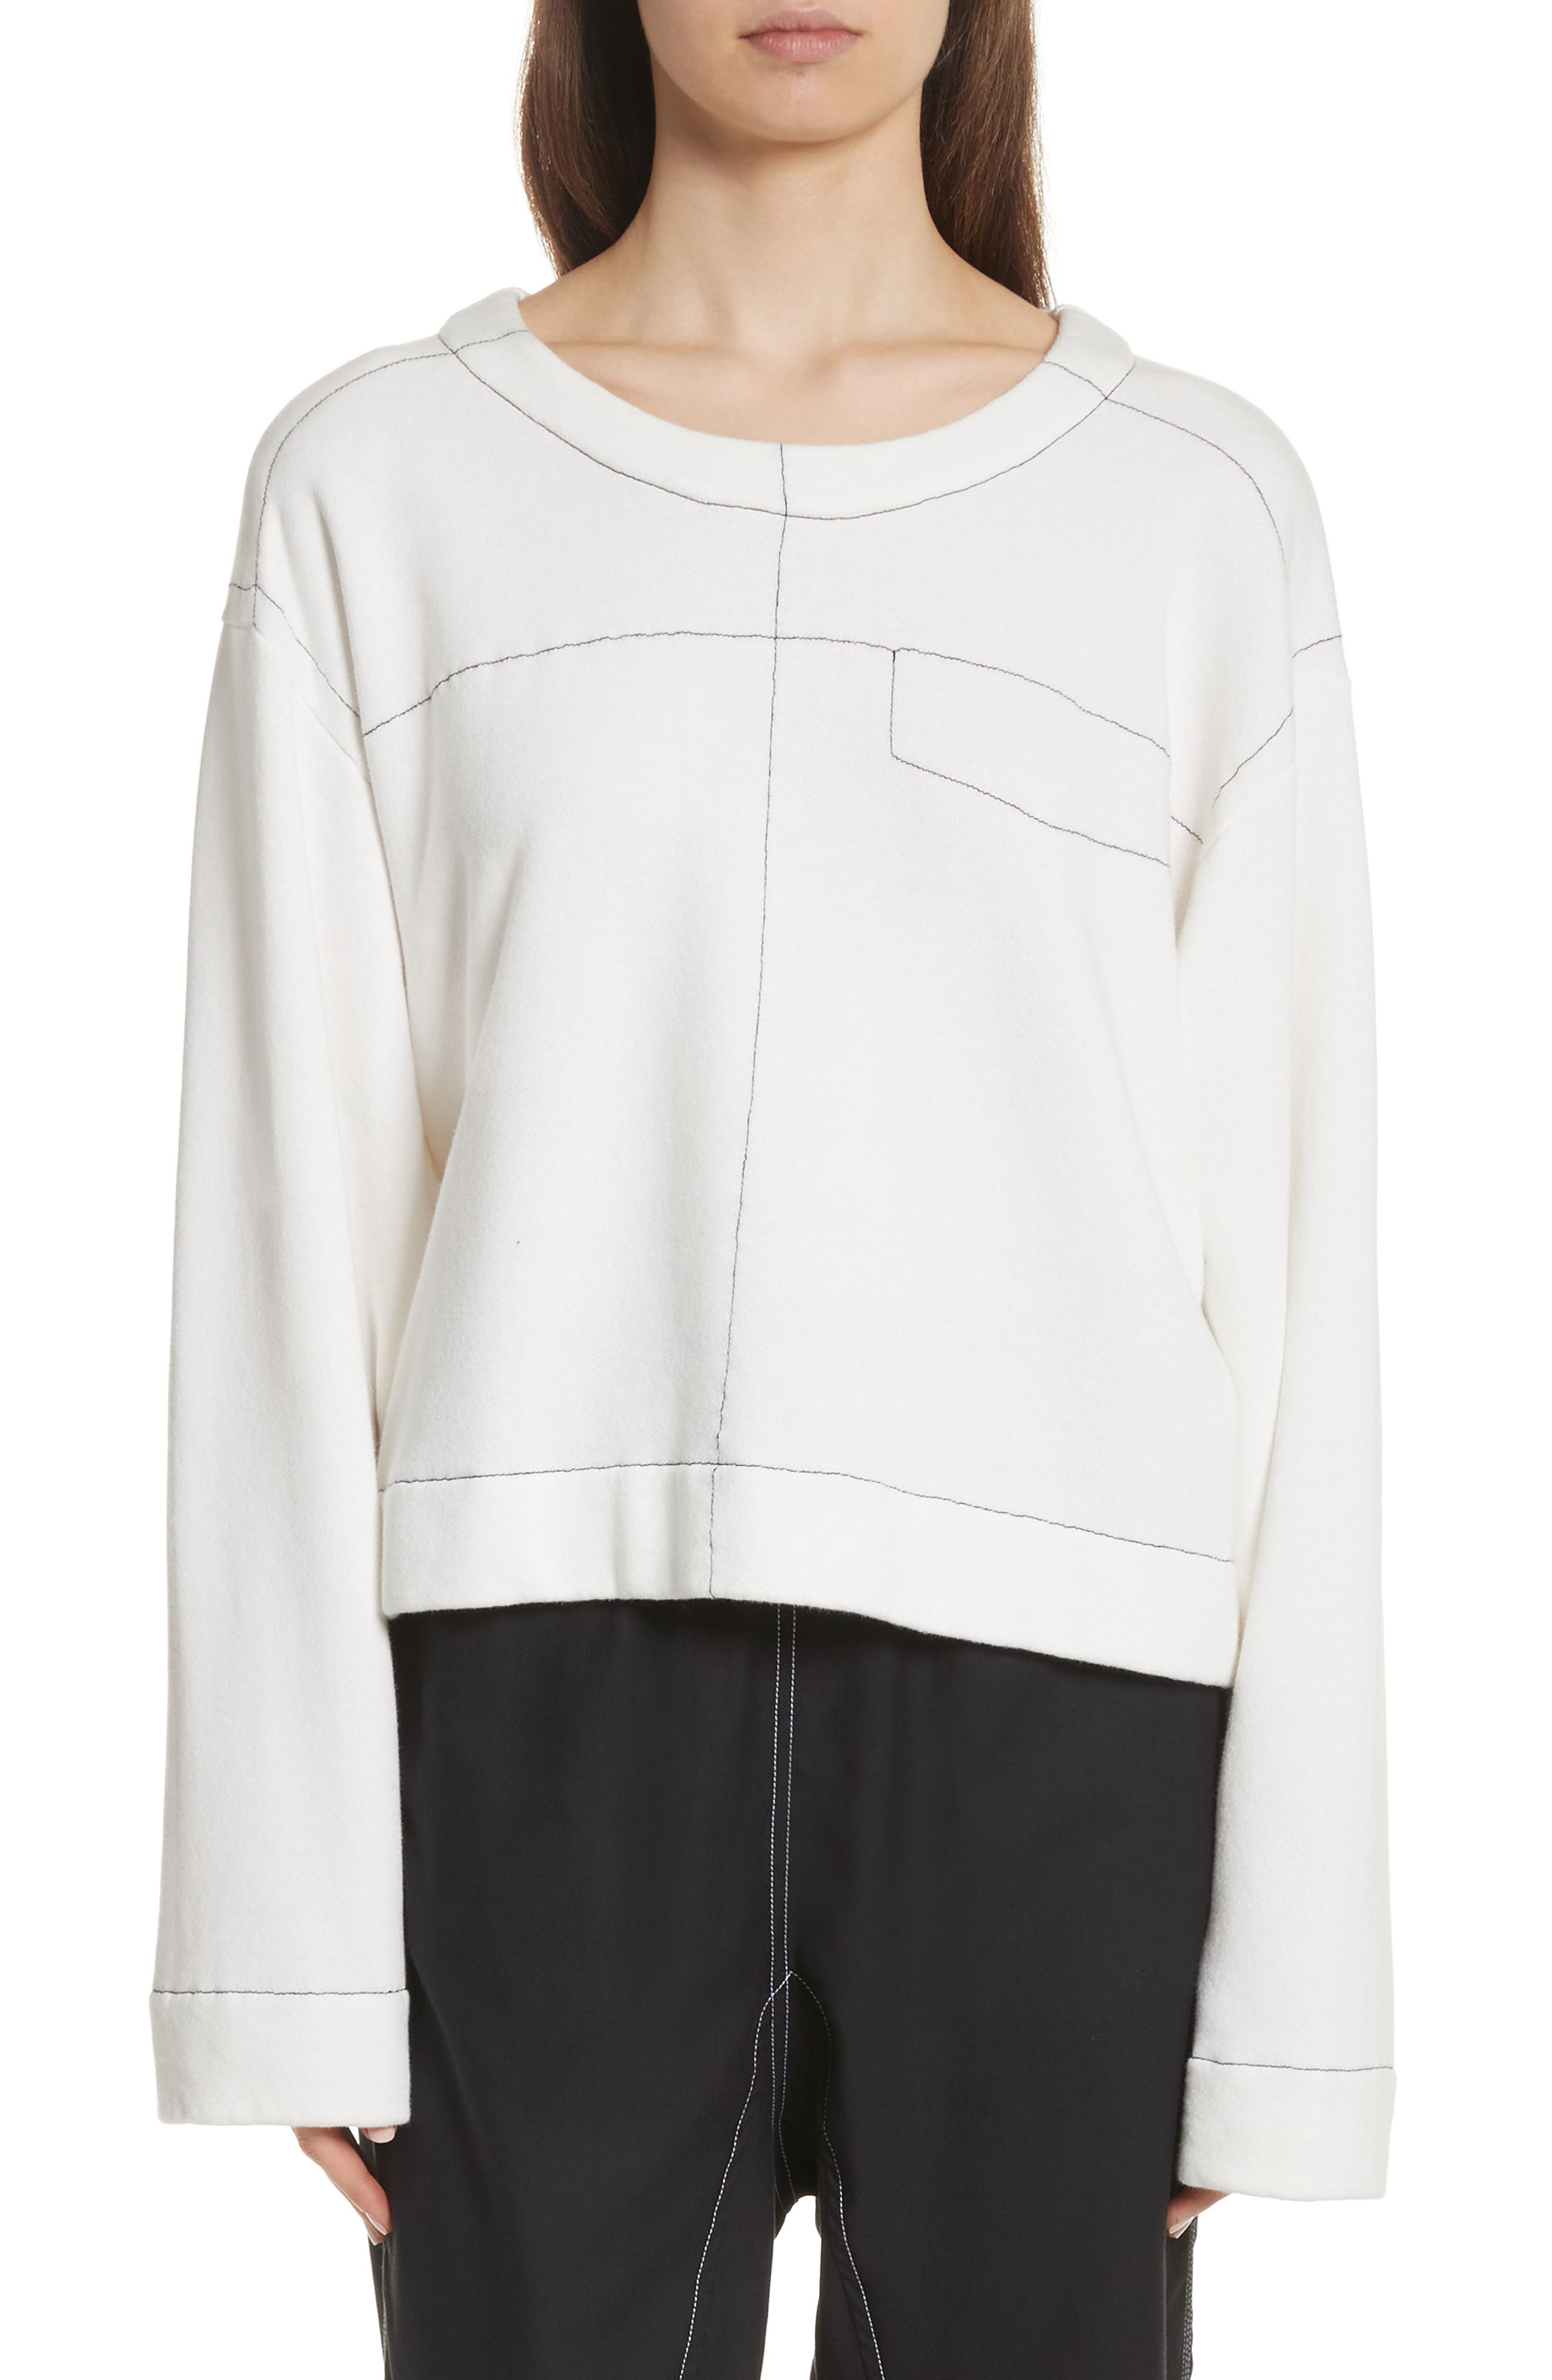 MM6 Maison Margiela Topstitch Sweater